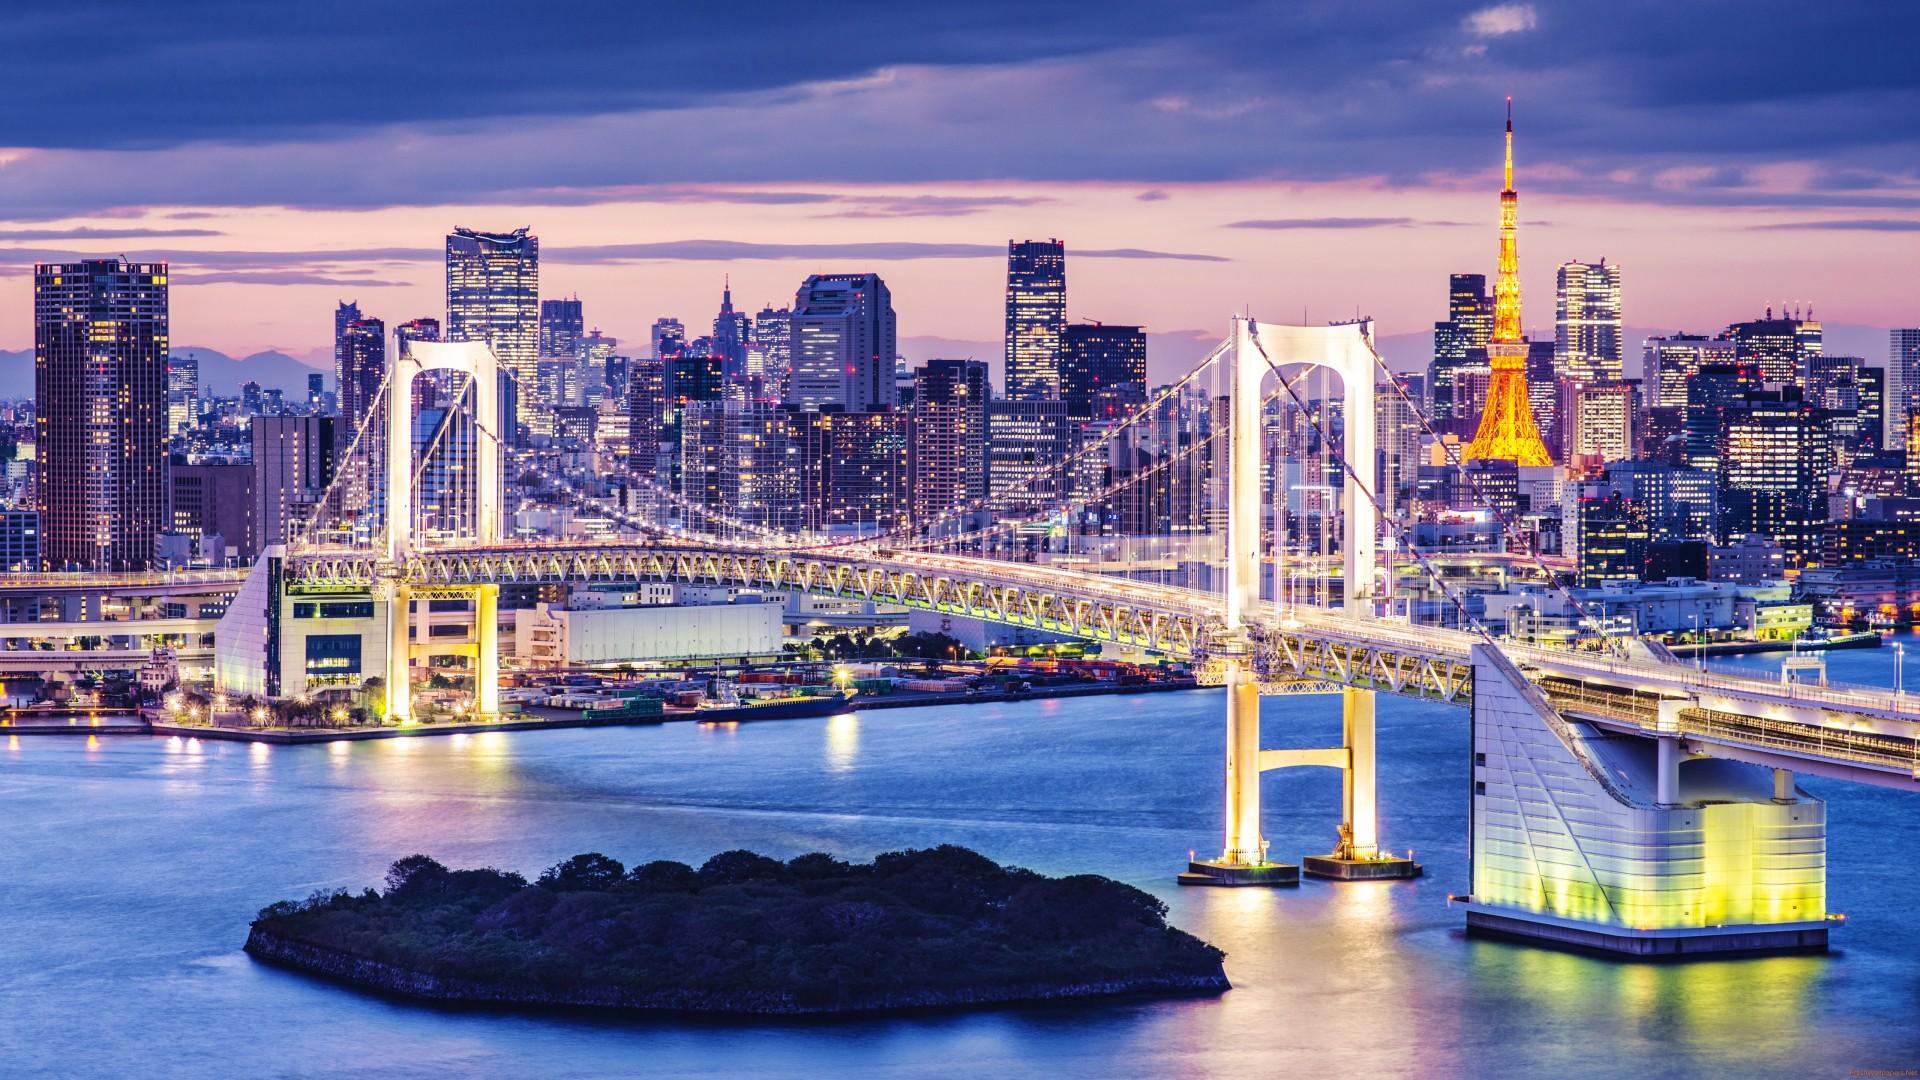 rainbow-bridge-tokyo-bay.jpg